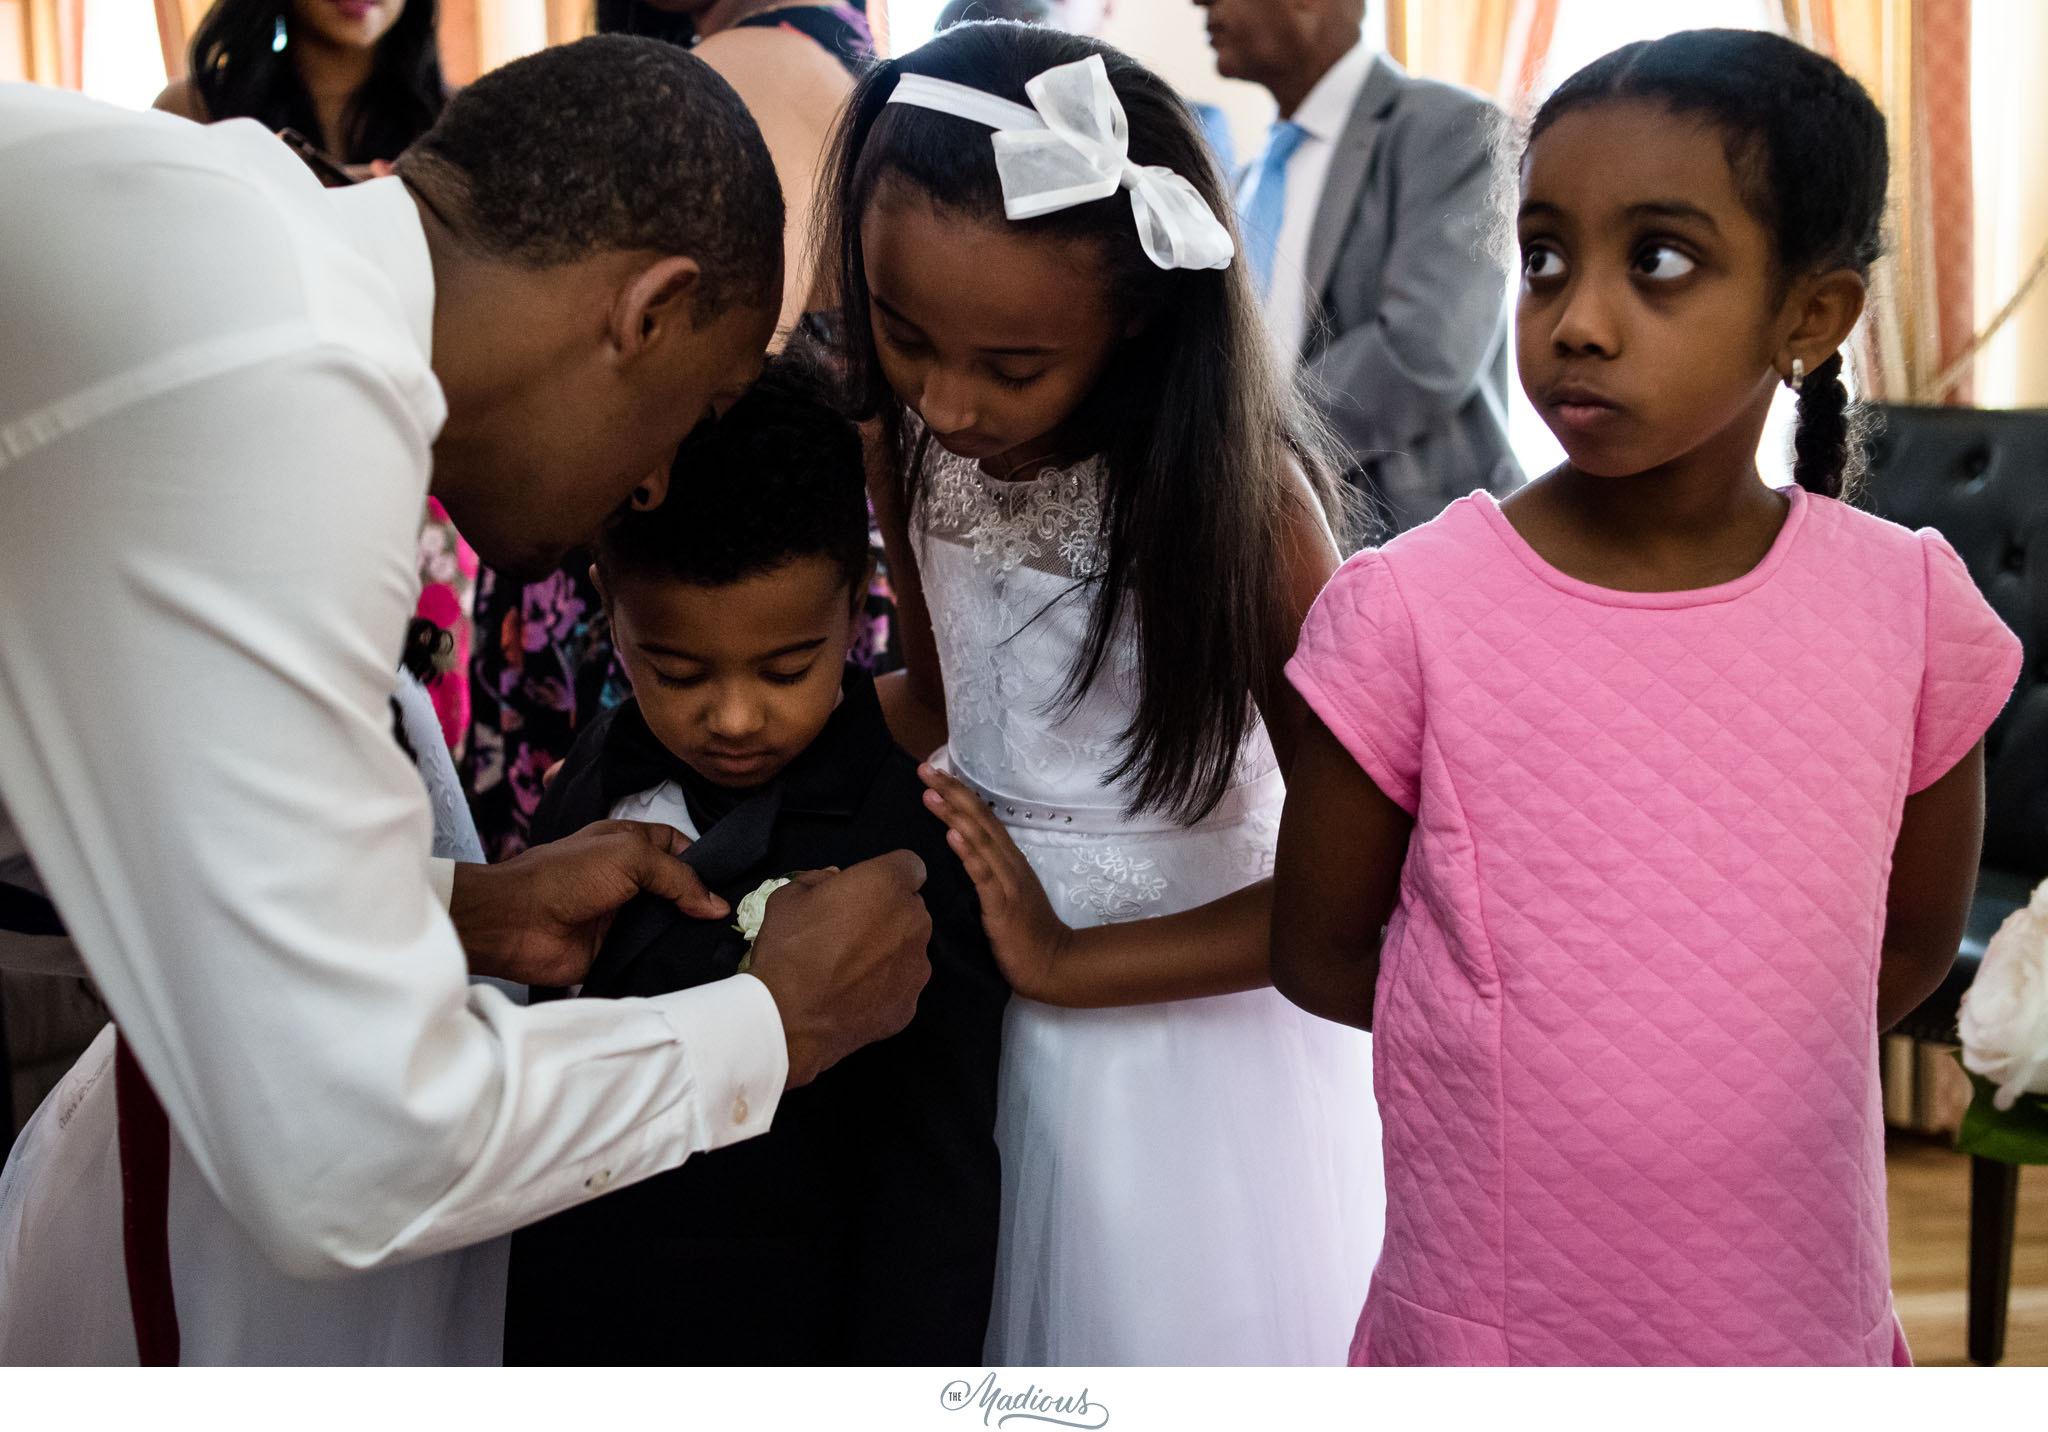 nmwa+wedding,+women+in+the+arts+wedding,+ethiopian+wedding,+dc+wedding+0032.jpg